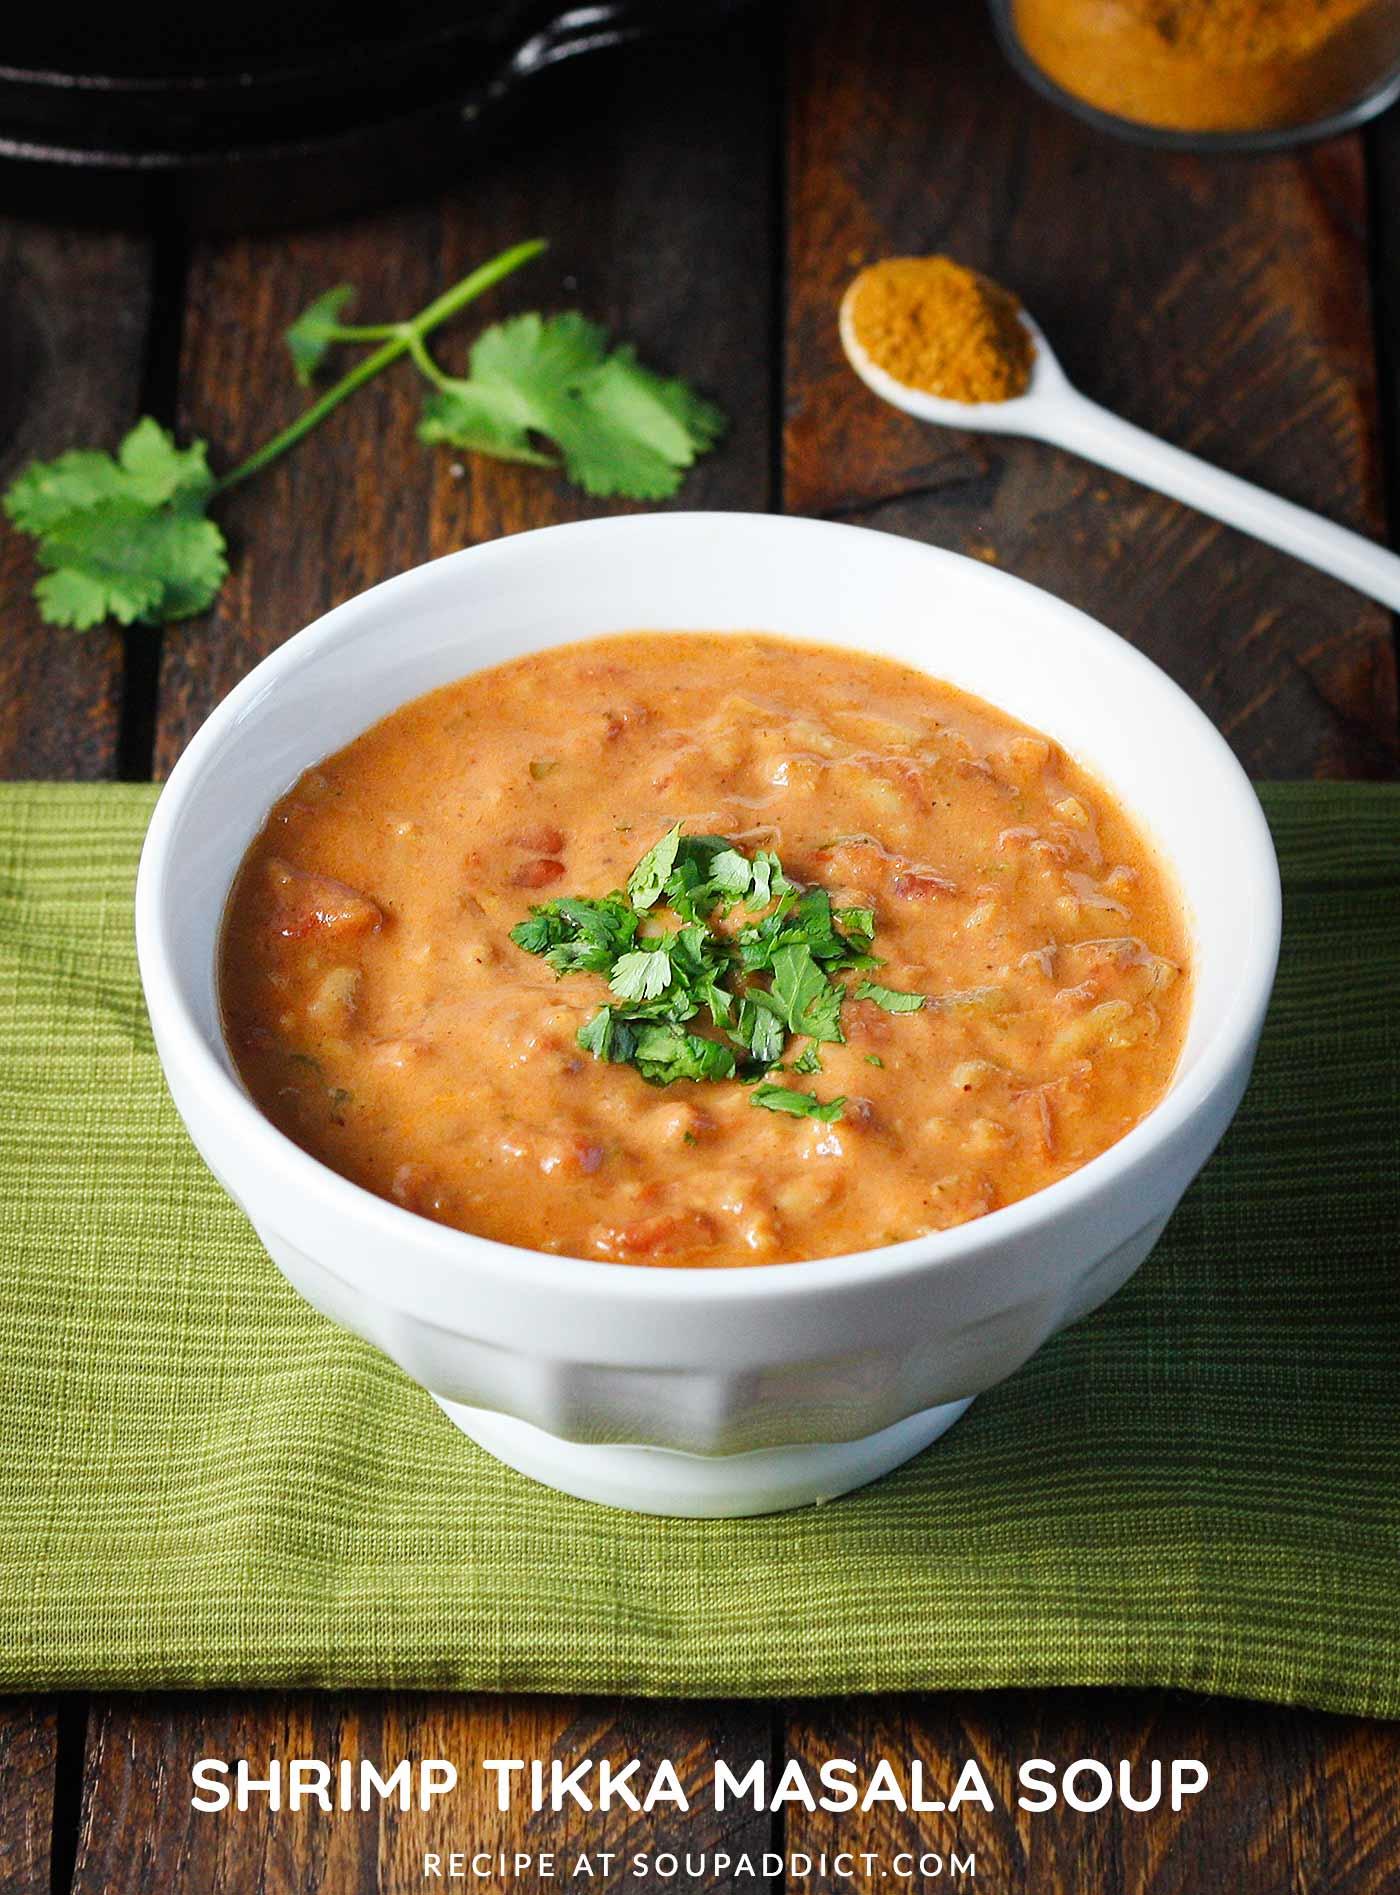 Shrimp Tikka Masala Soup - Recipe at SoupAddict.com